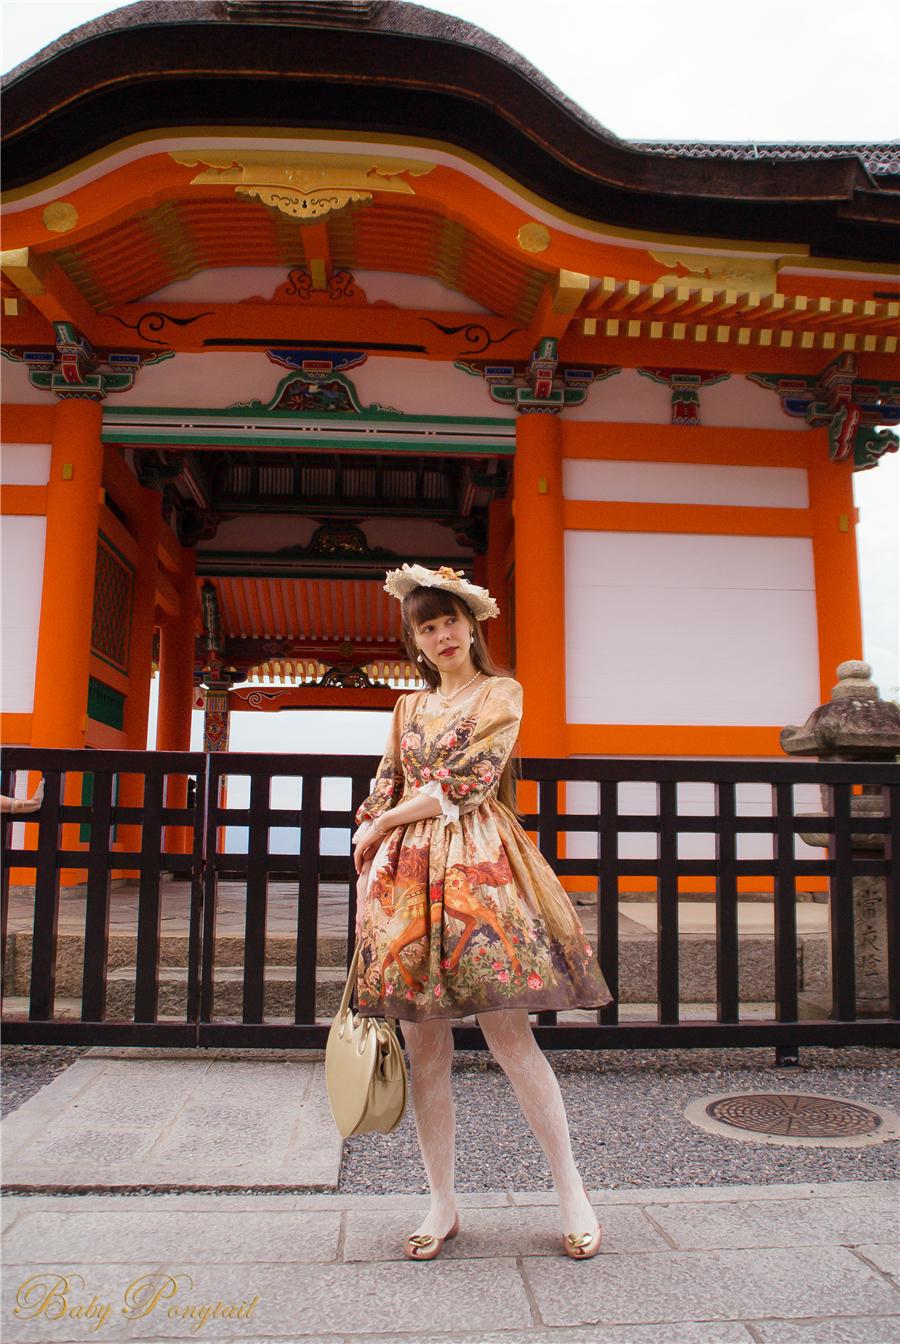 BabyPonytail_Rose Battle_Model Photo_OP Amber_Claudia_25.jpg